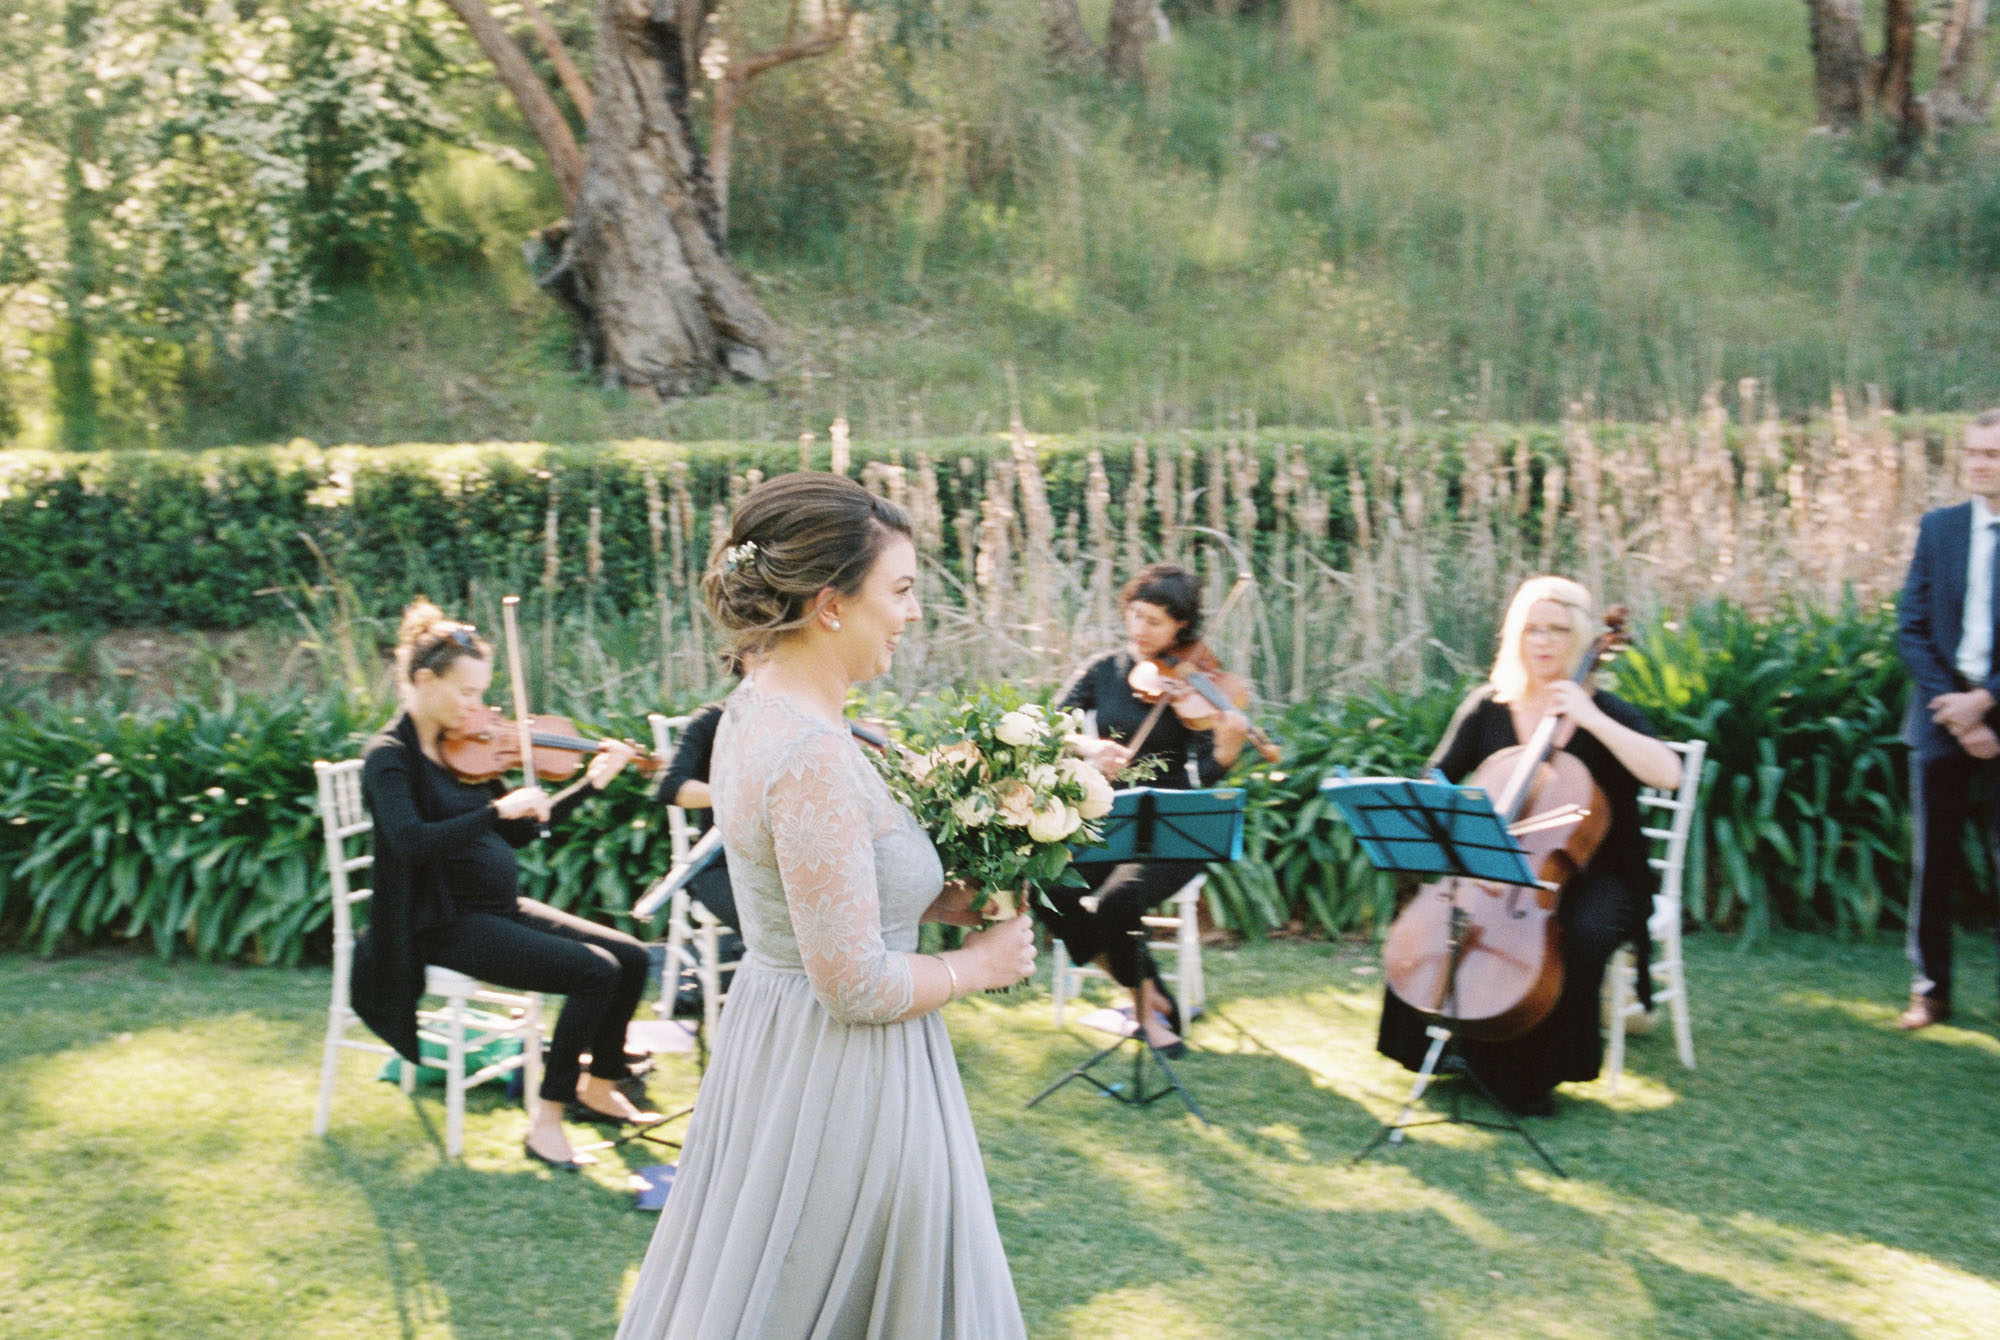 Glen-Ewin-Estate-wedding-photography-032.jpg